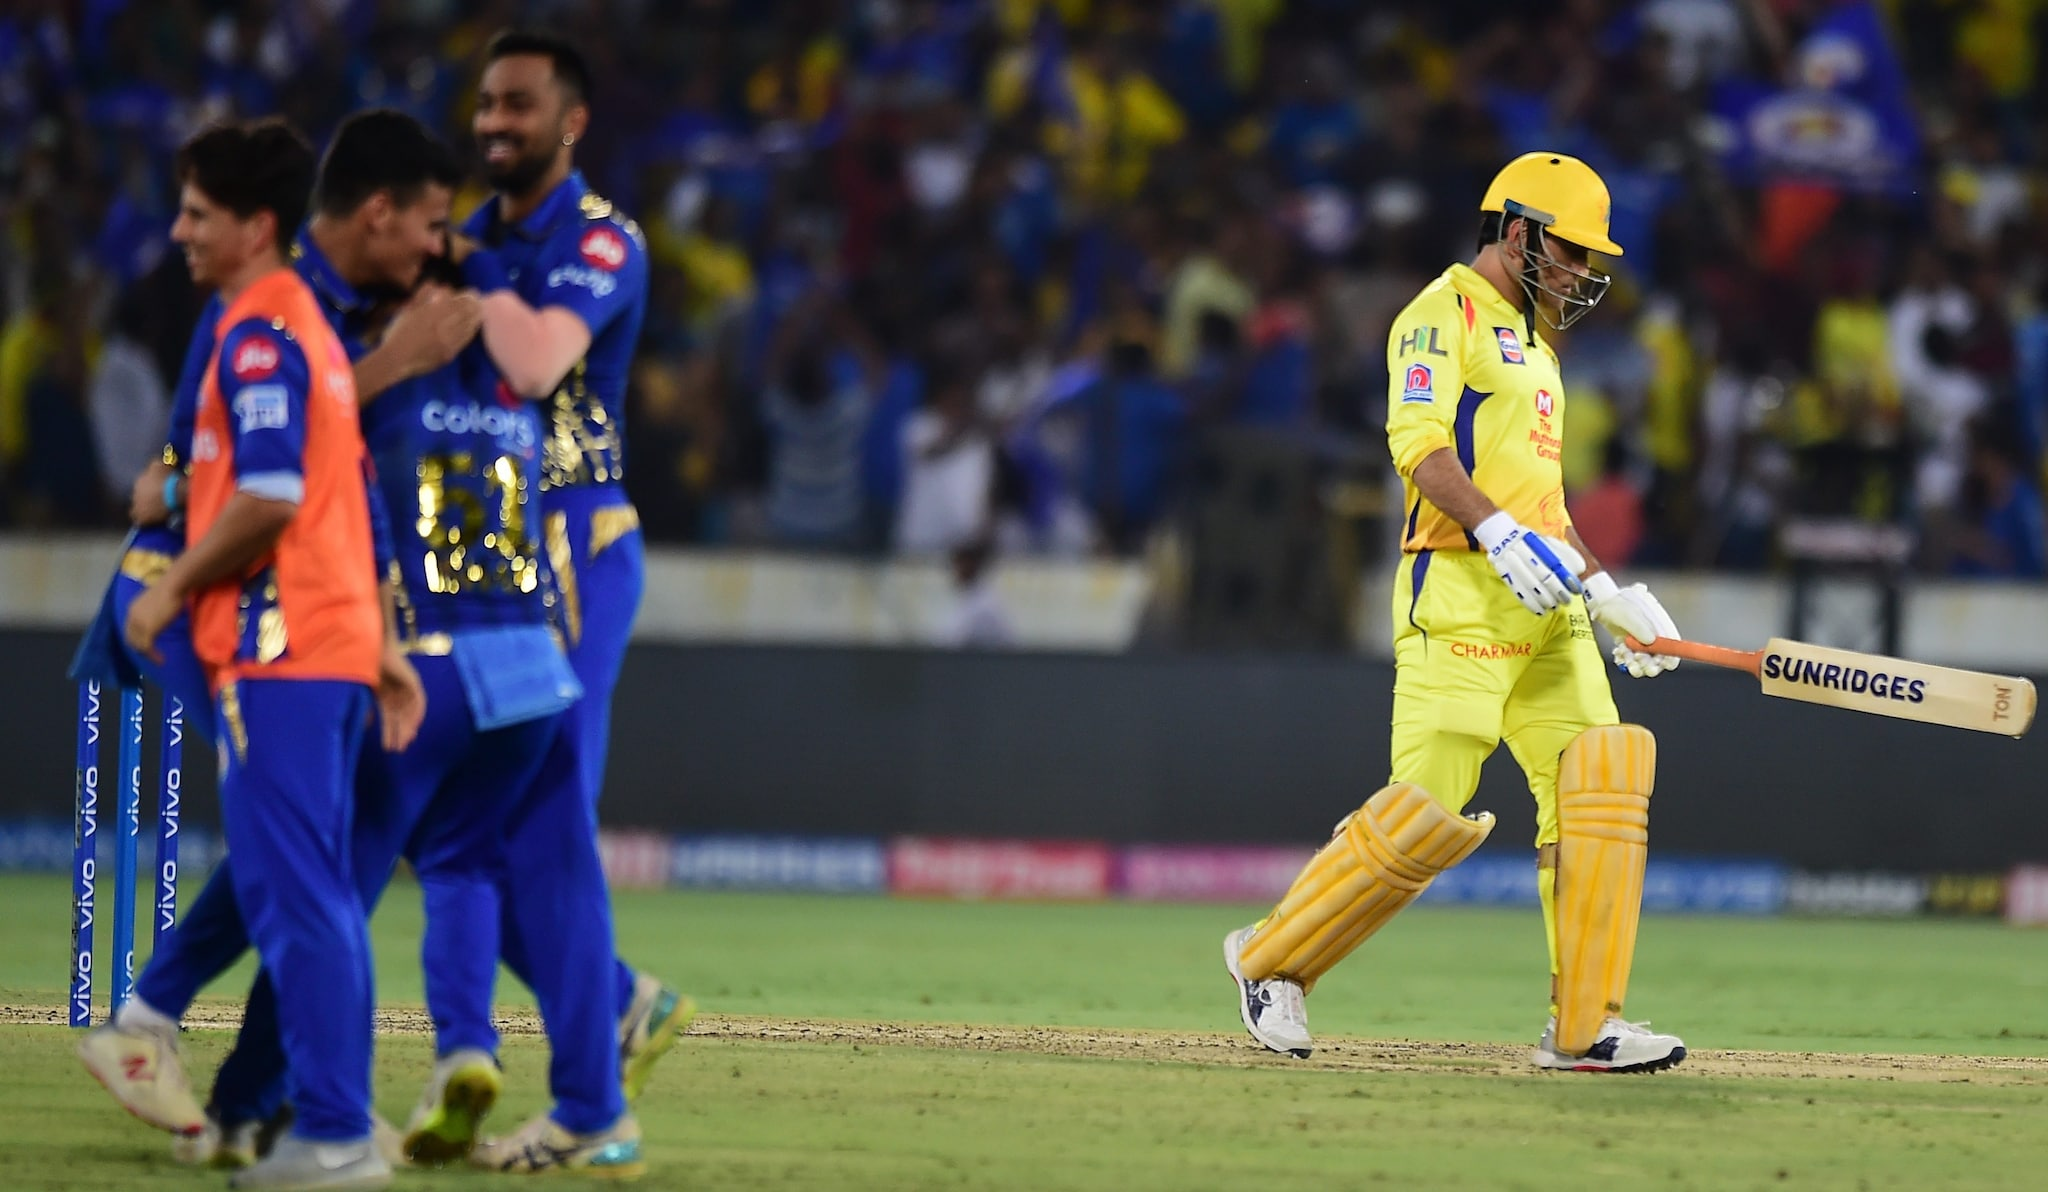 Mumbai Indians (MI) player Ishan Kishan celebrating with teammates for the run out of Chennai Super Kings (CSK) skipper MS Dhoni | PTI